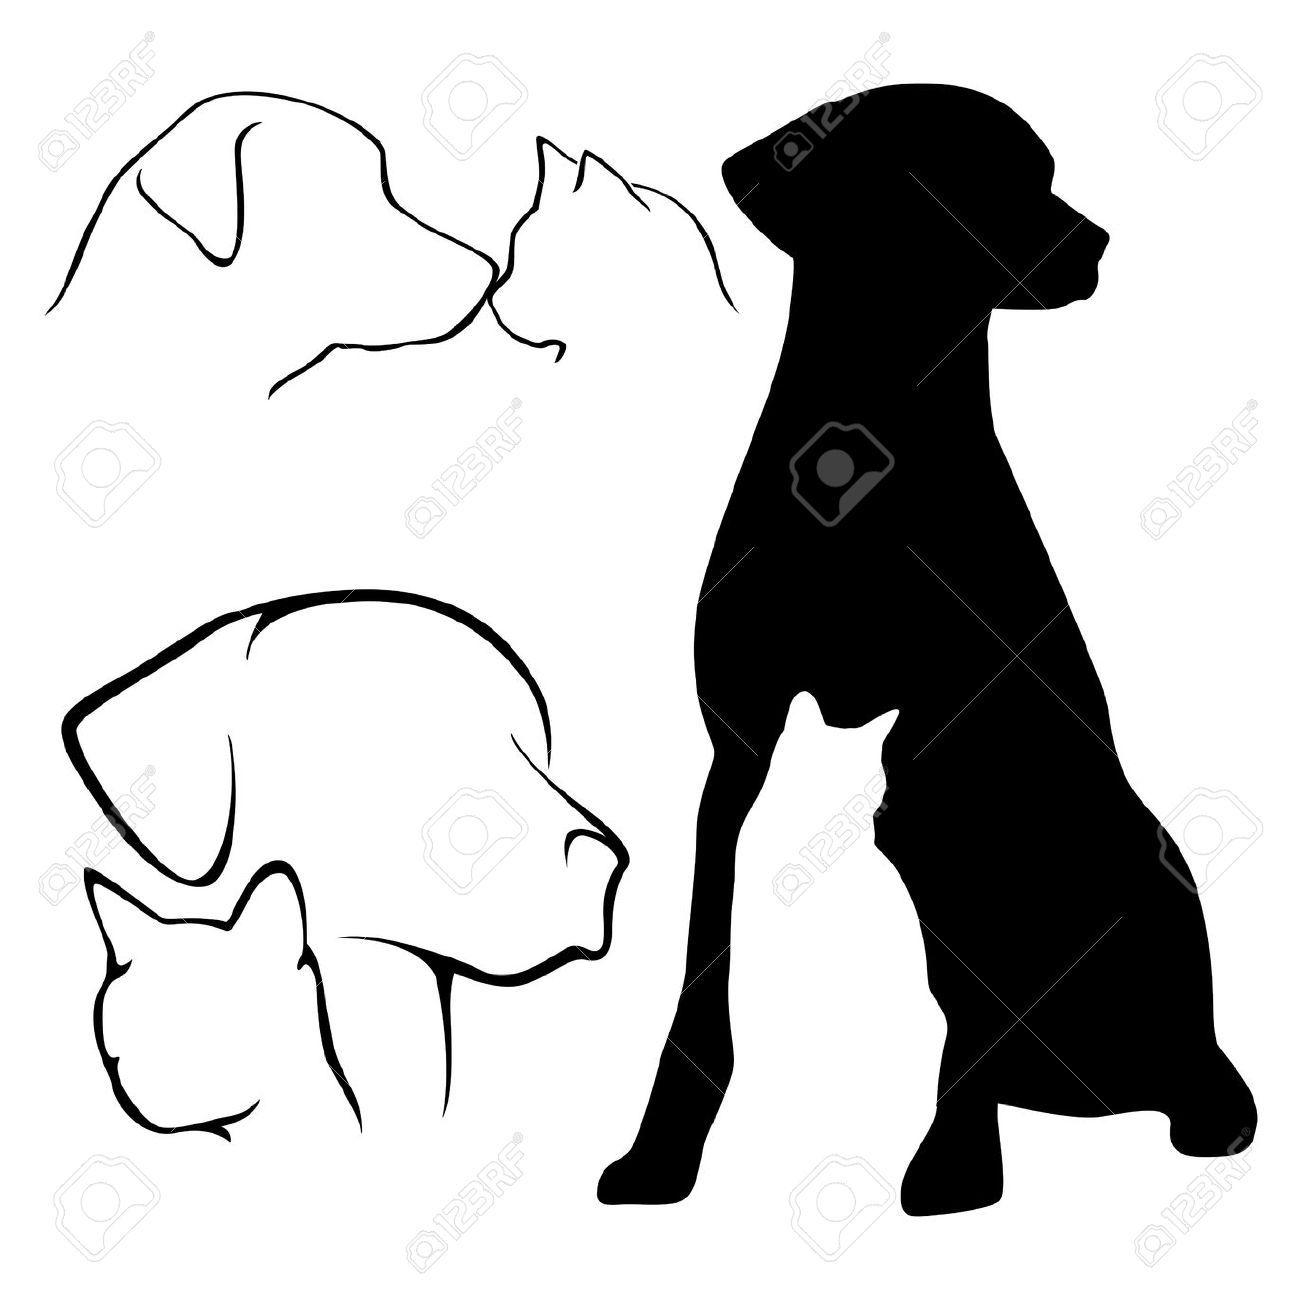 labrador silhouette google search patterns for crafts rh pinterest com